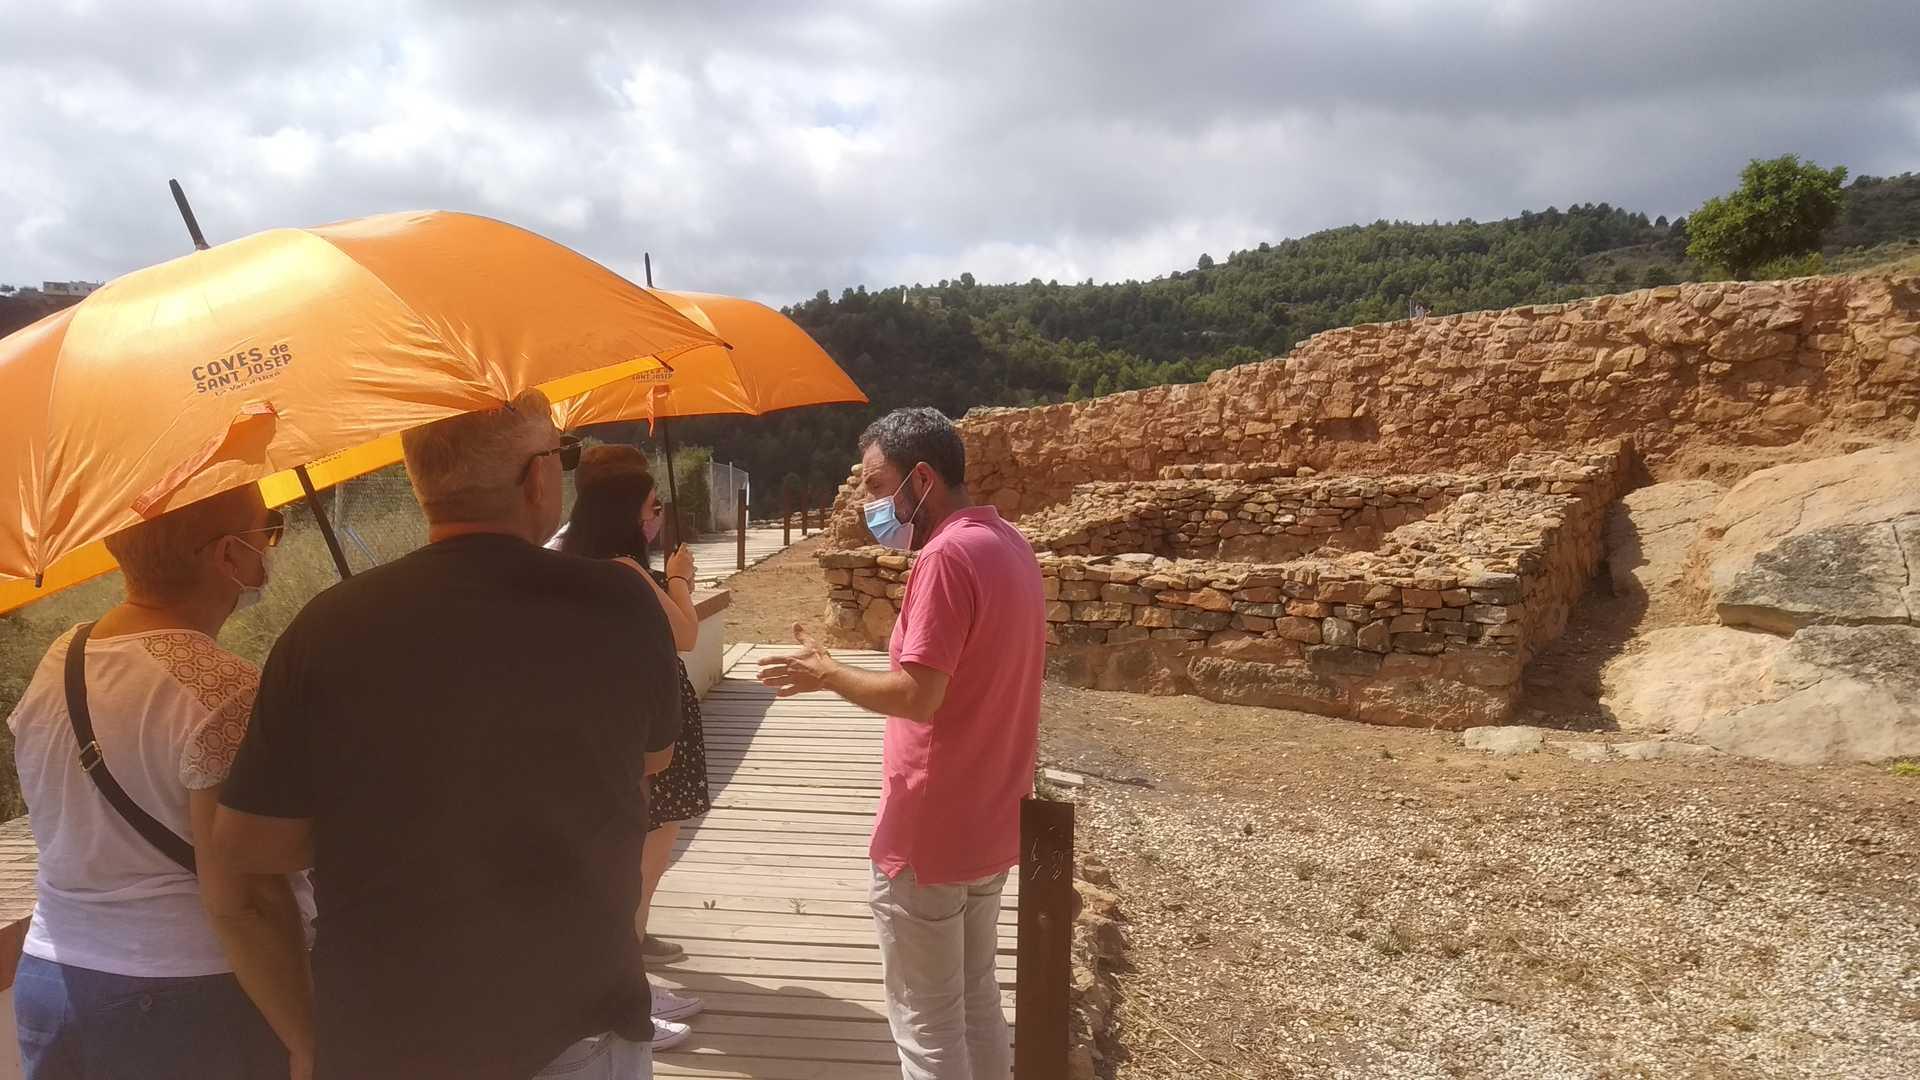 Visitas guiadas al Poblado de Sant Josep